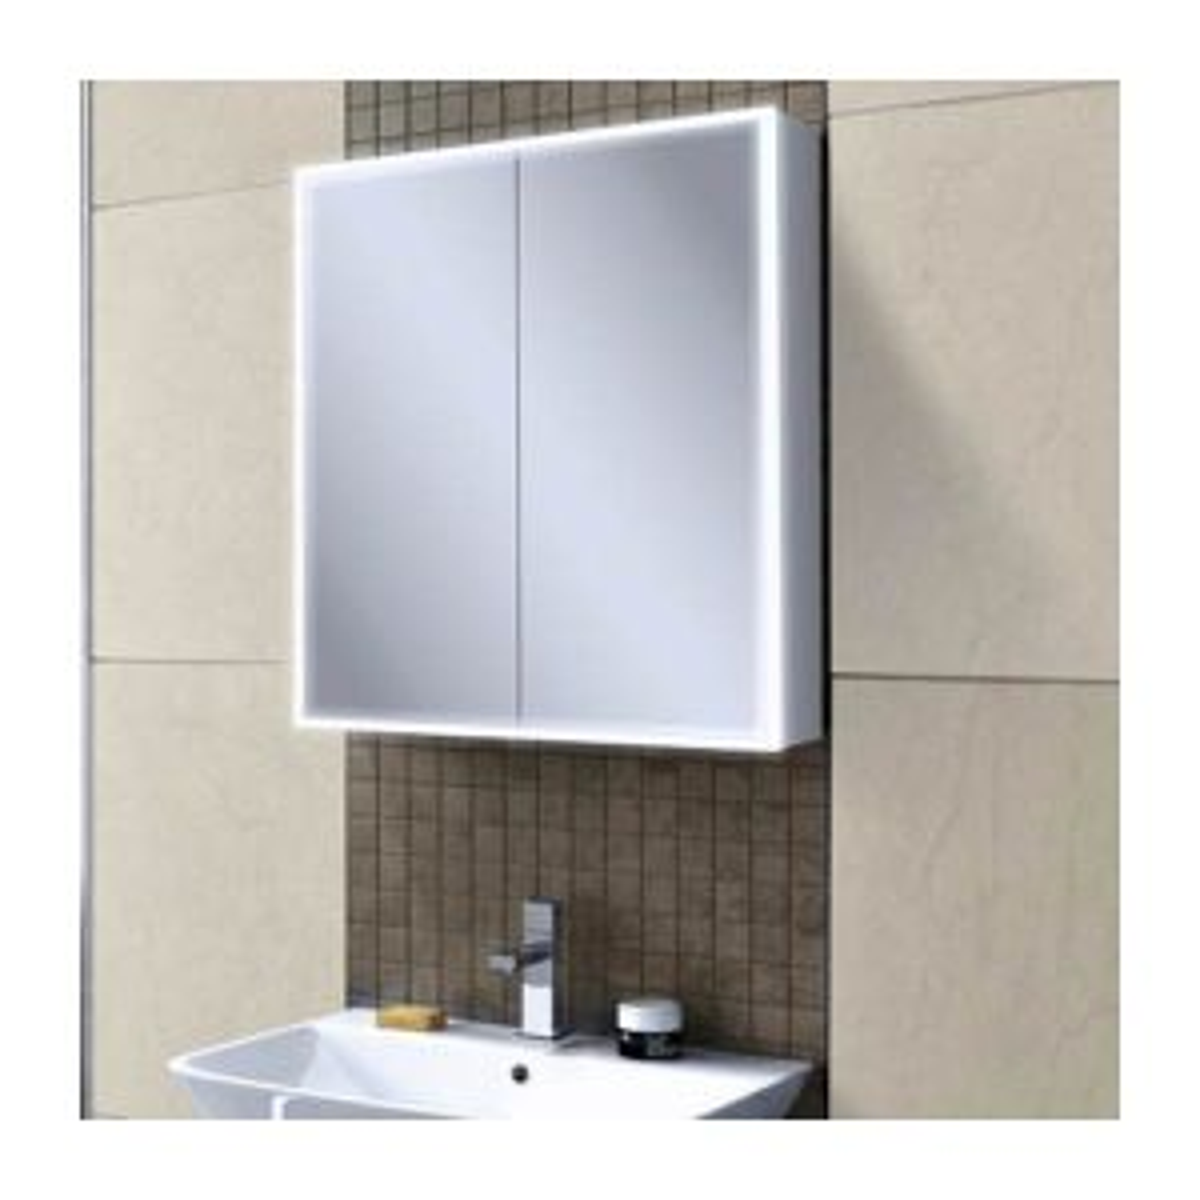 HiB Qubic 60 LED Double Door Cabinet